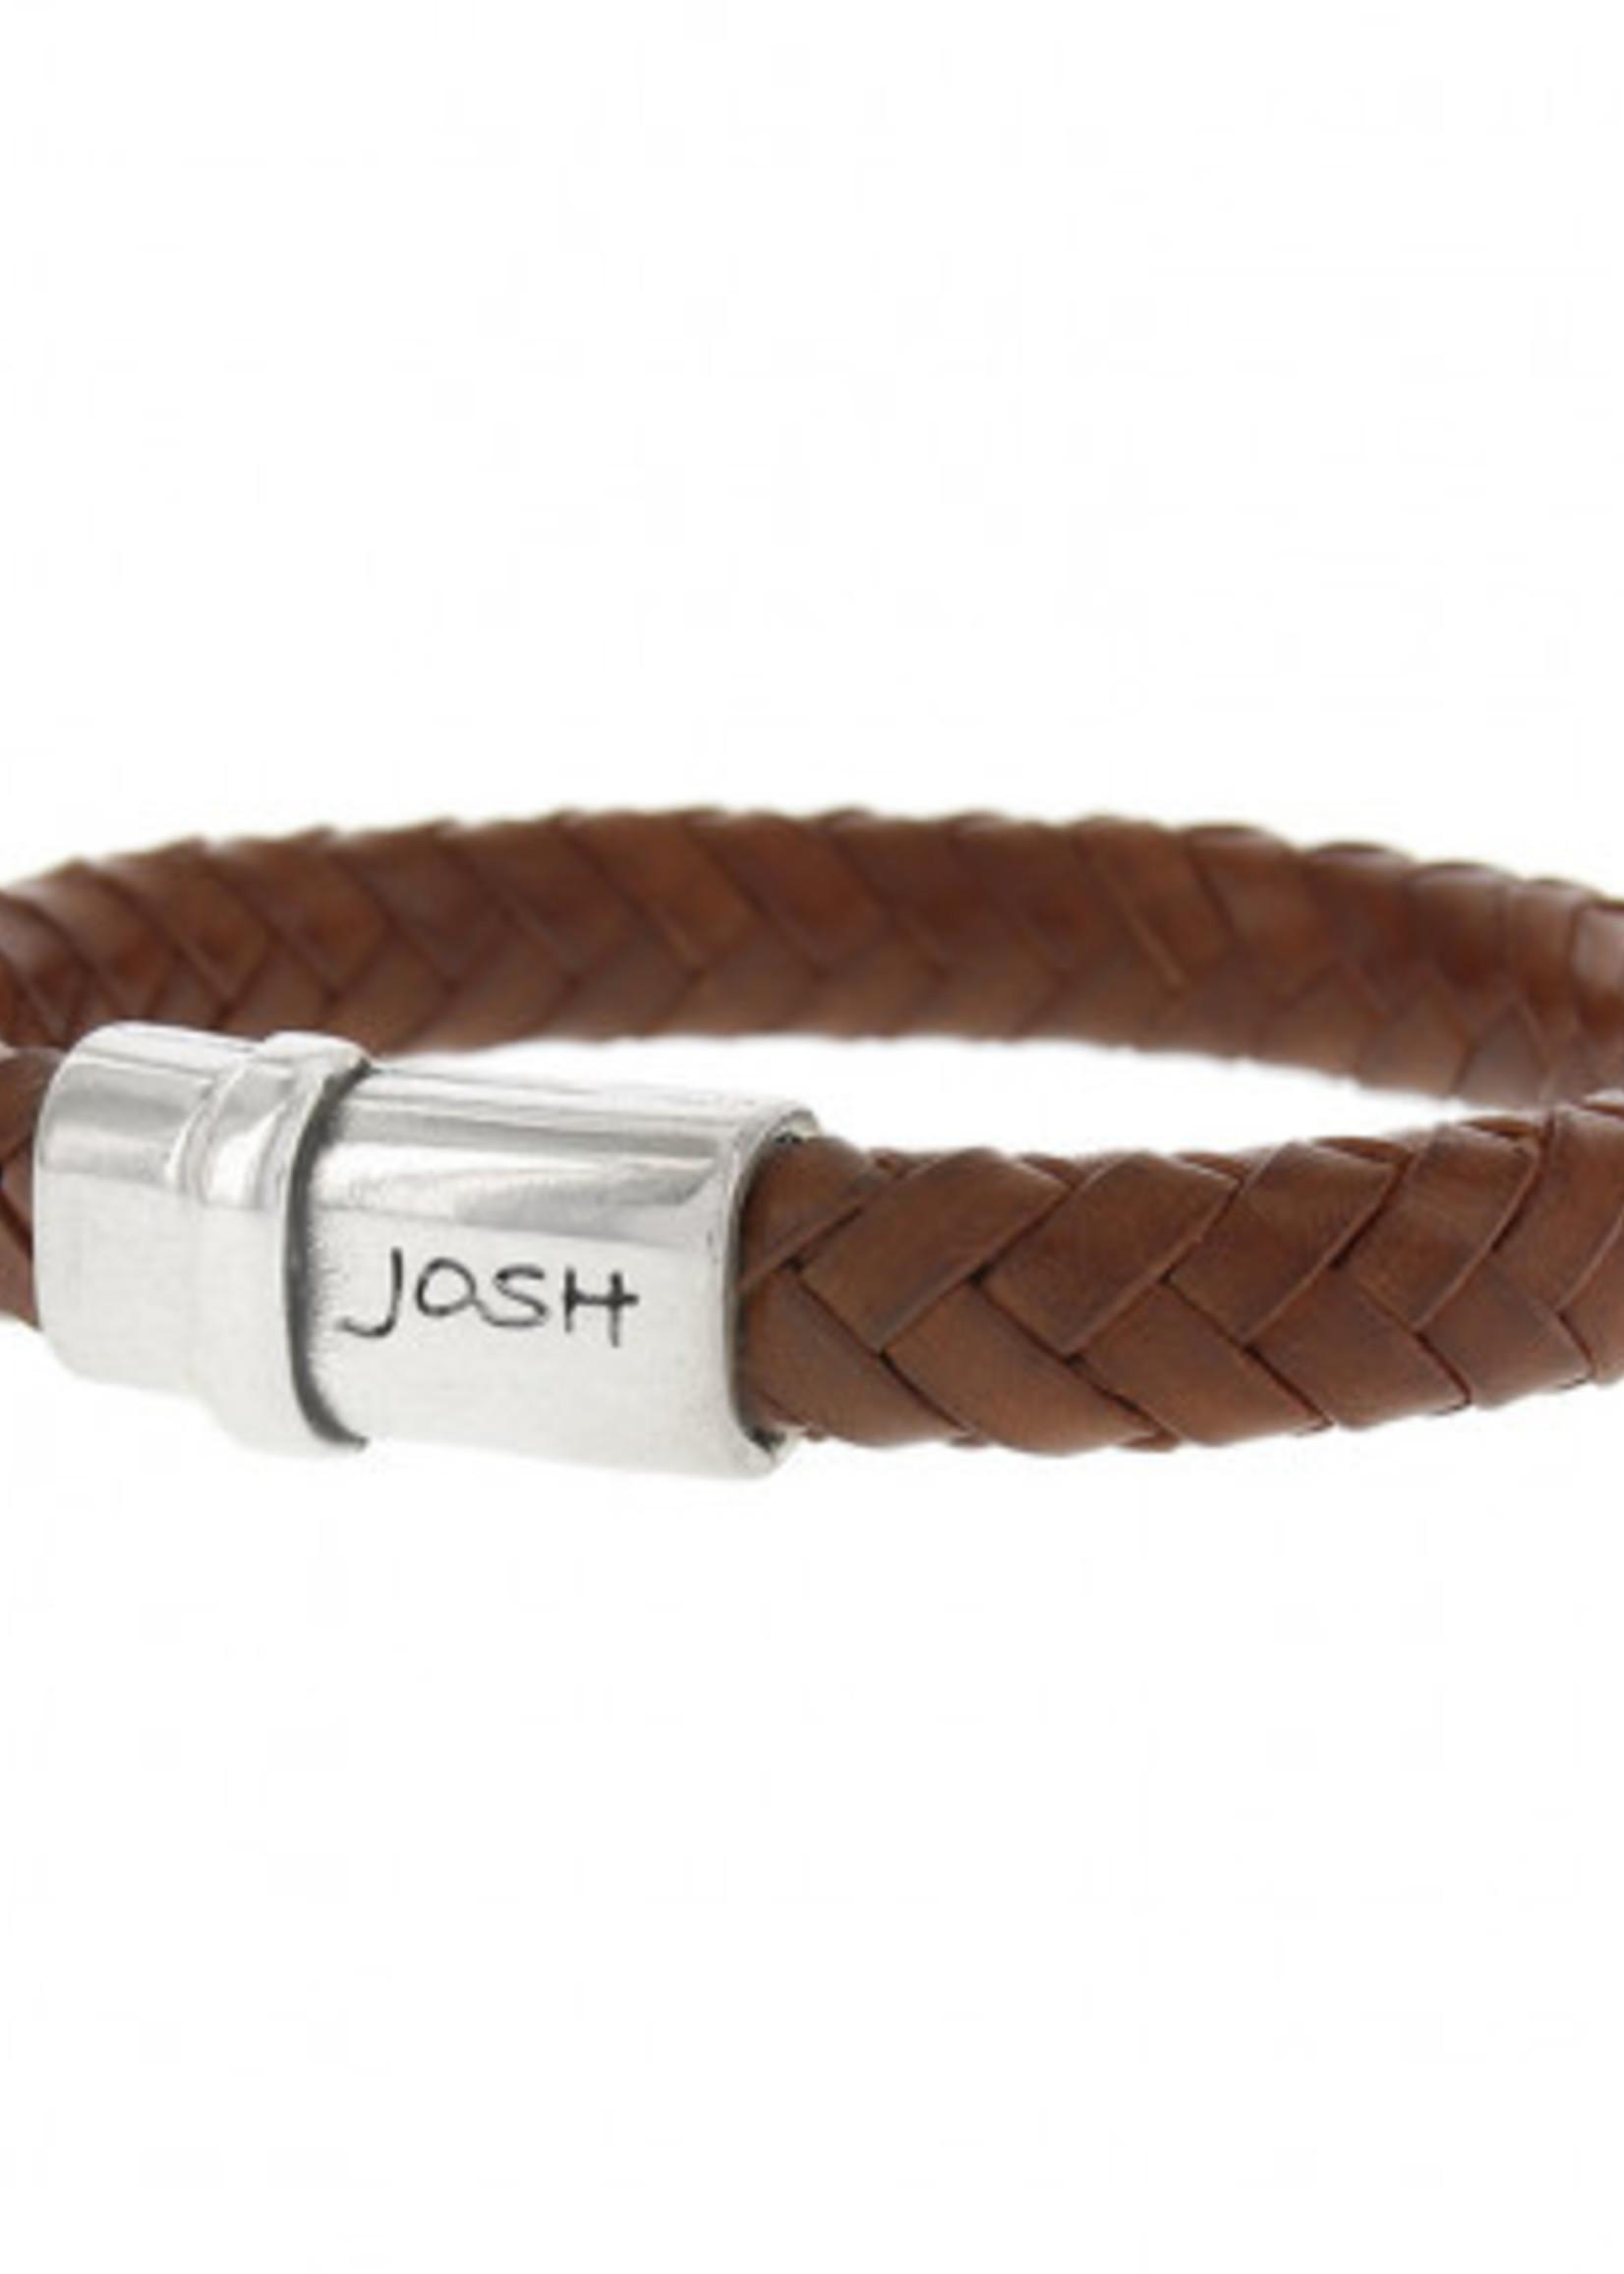 Josh Armband Heren 09073 Cognac